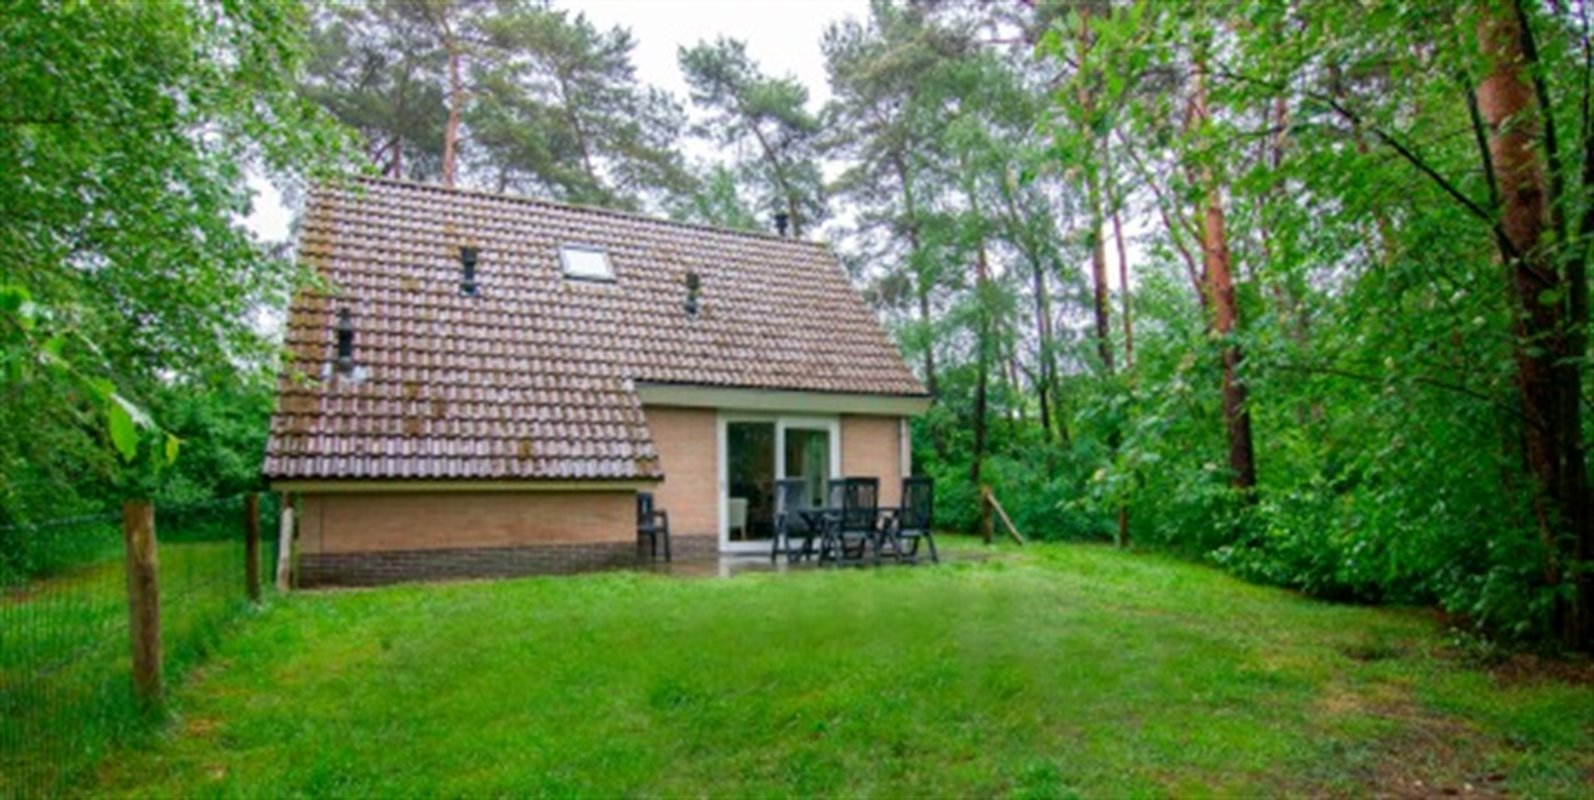 Landal Twenhaarsveld | 6-Pers.-Hunde-Ferienhaus...